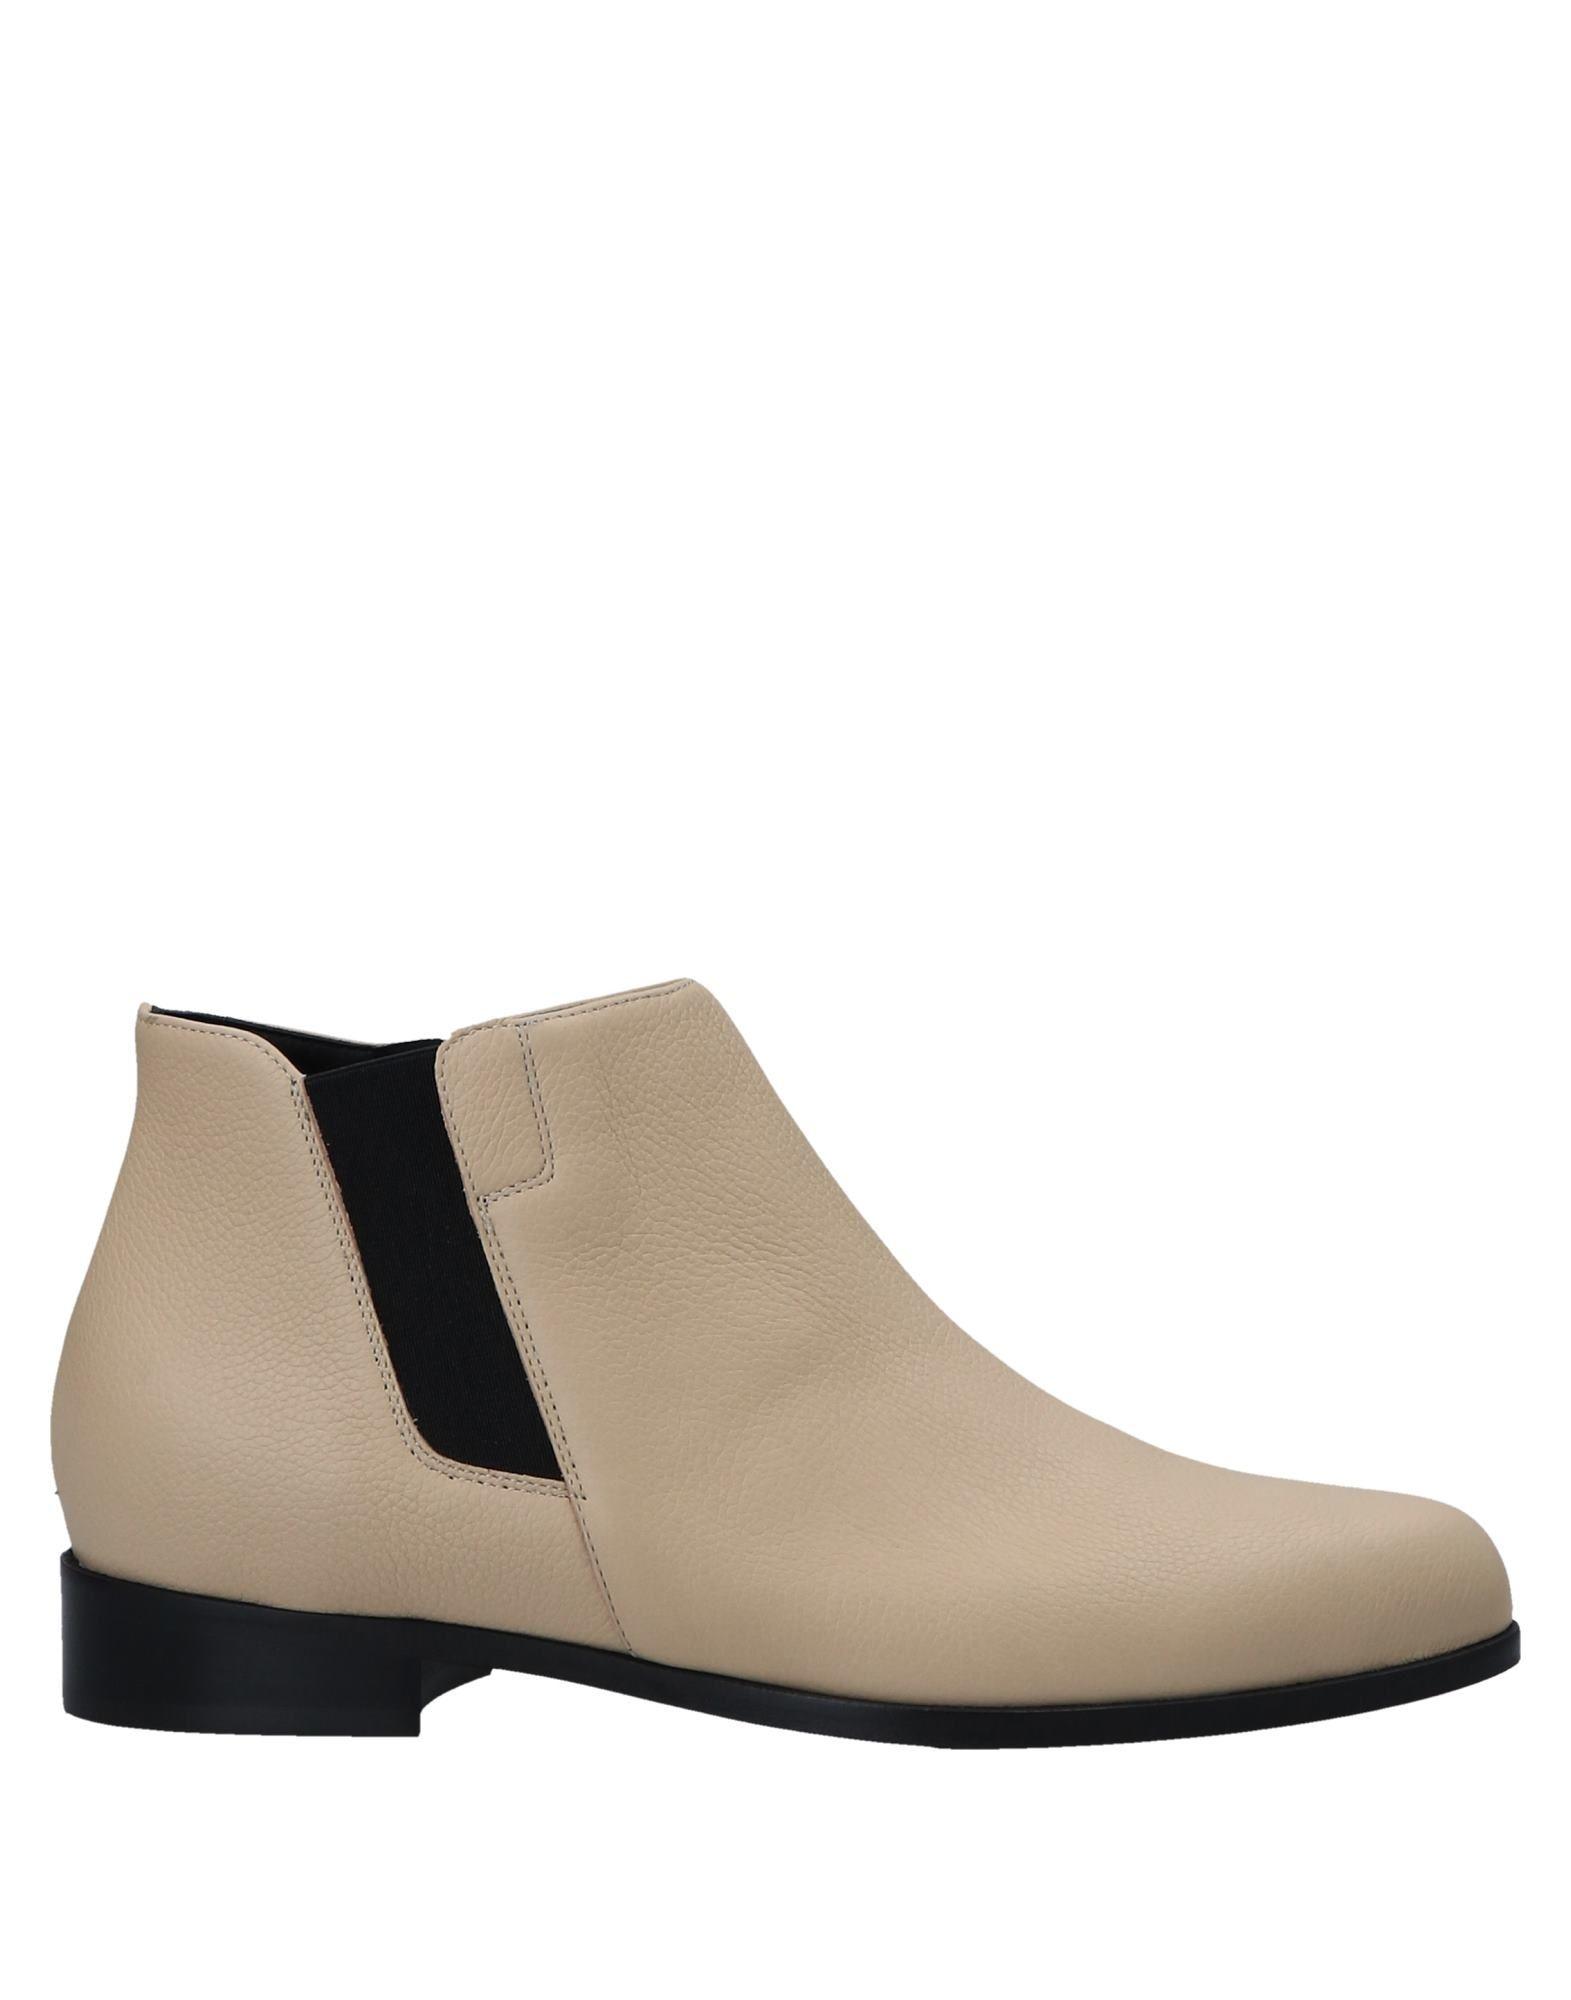 Giuseppe Zanotti Ankle Boot - Women online Giuseppe Zanotti Ankle Boots online Women on  Australia - 11545566LA e6427c